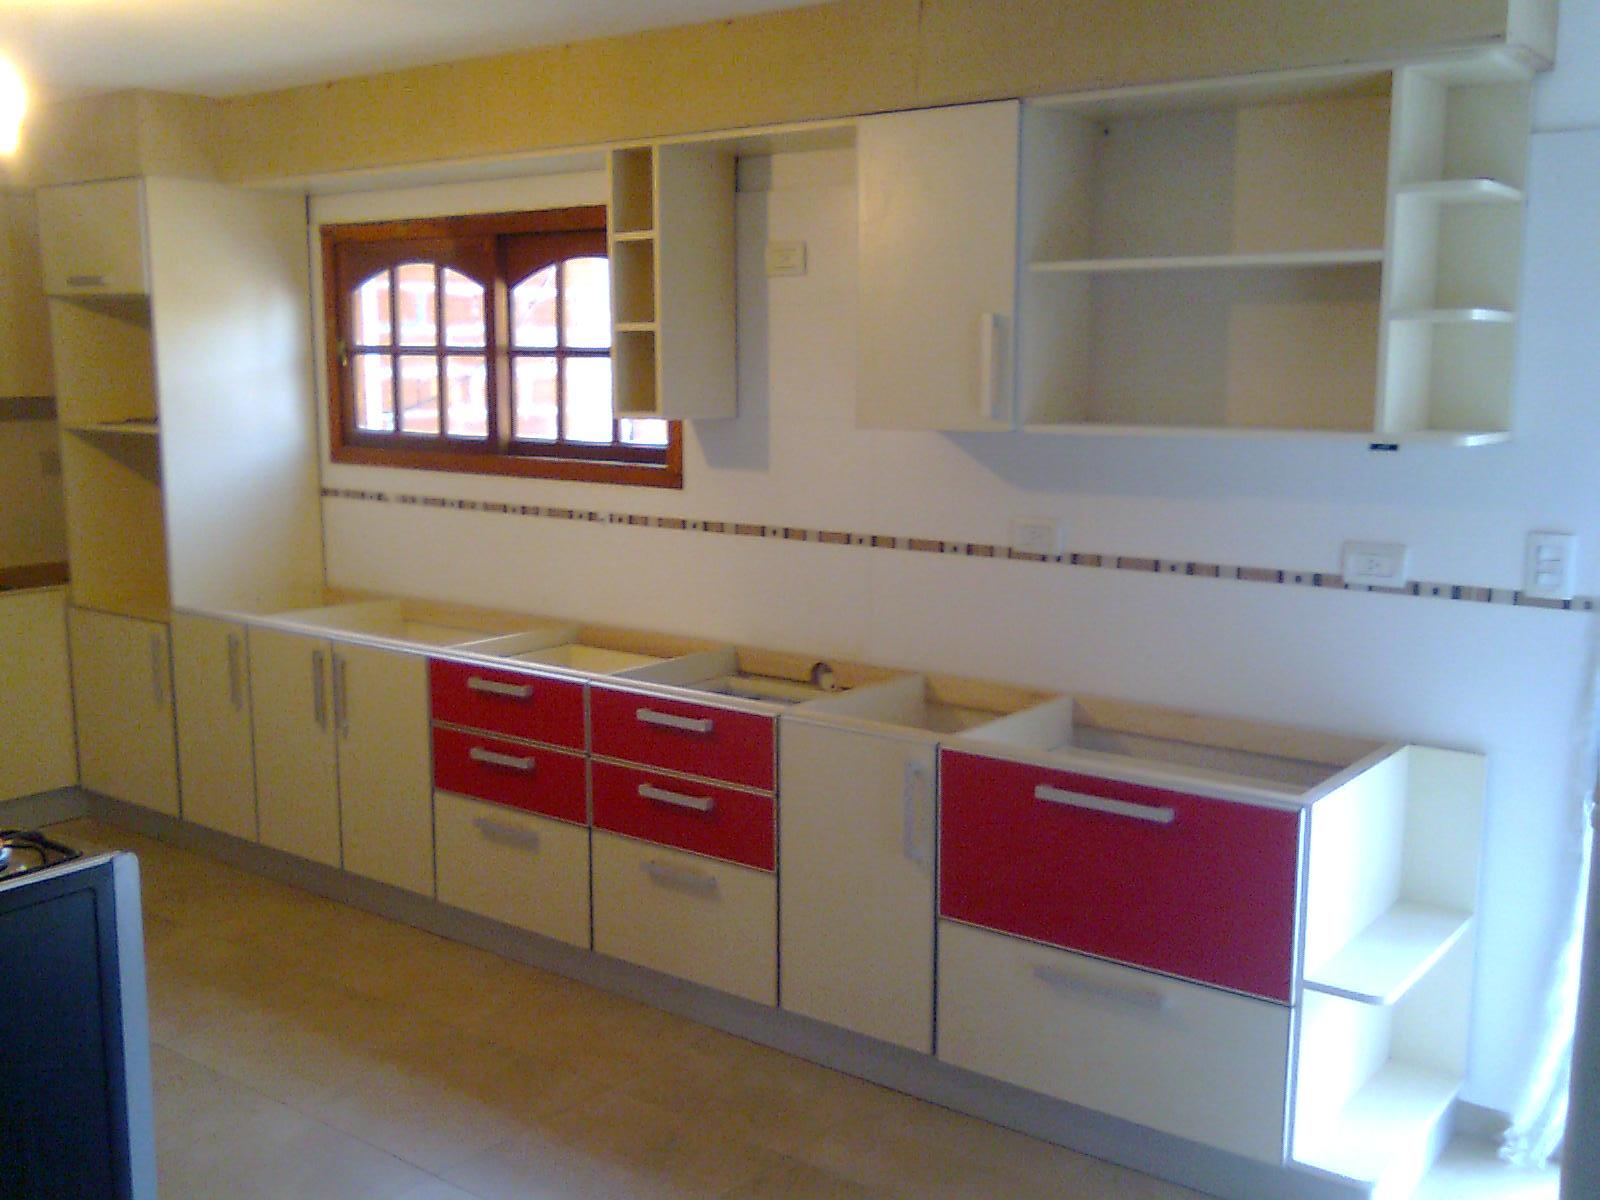 Benjamin cocina en melamina blanca con detalles rojos for Severino muebles cocina alacena melamina blanca